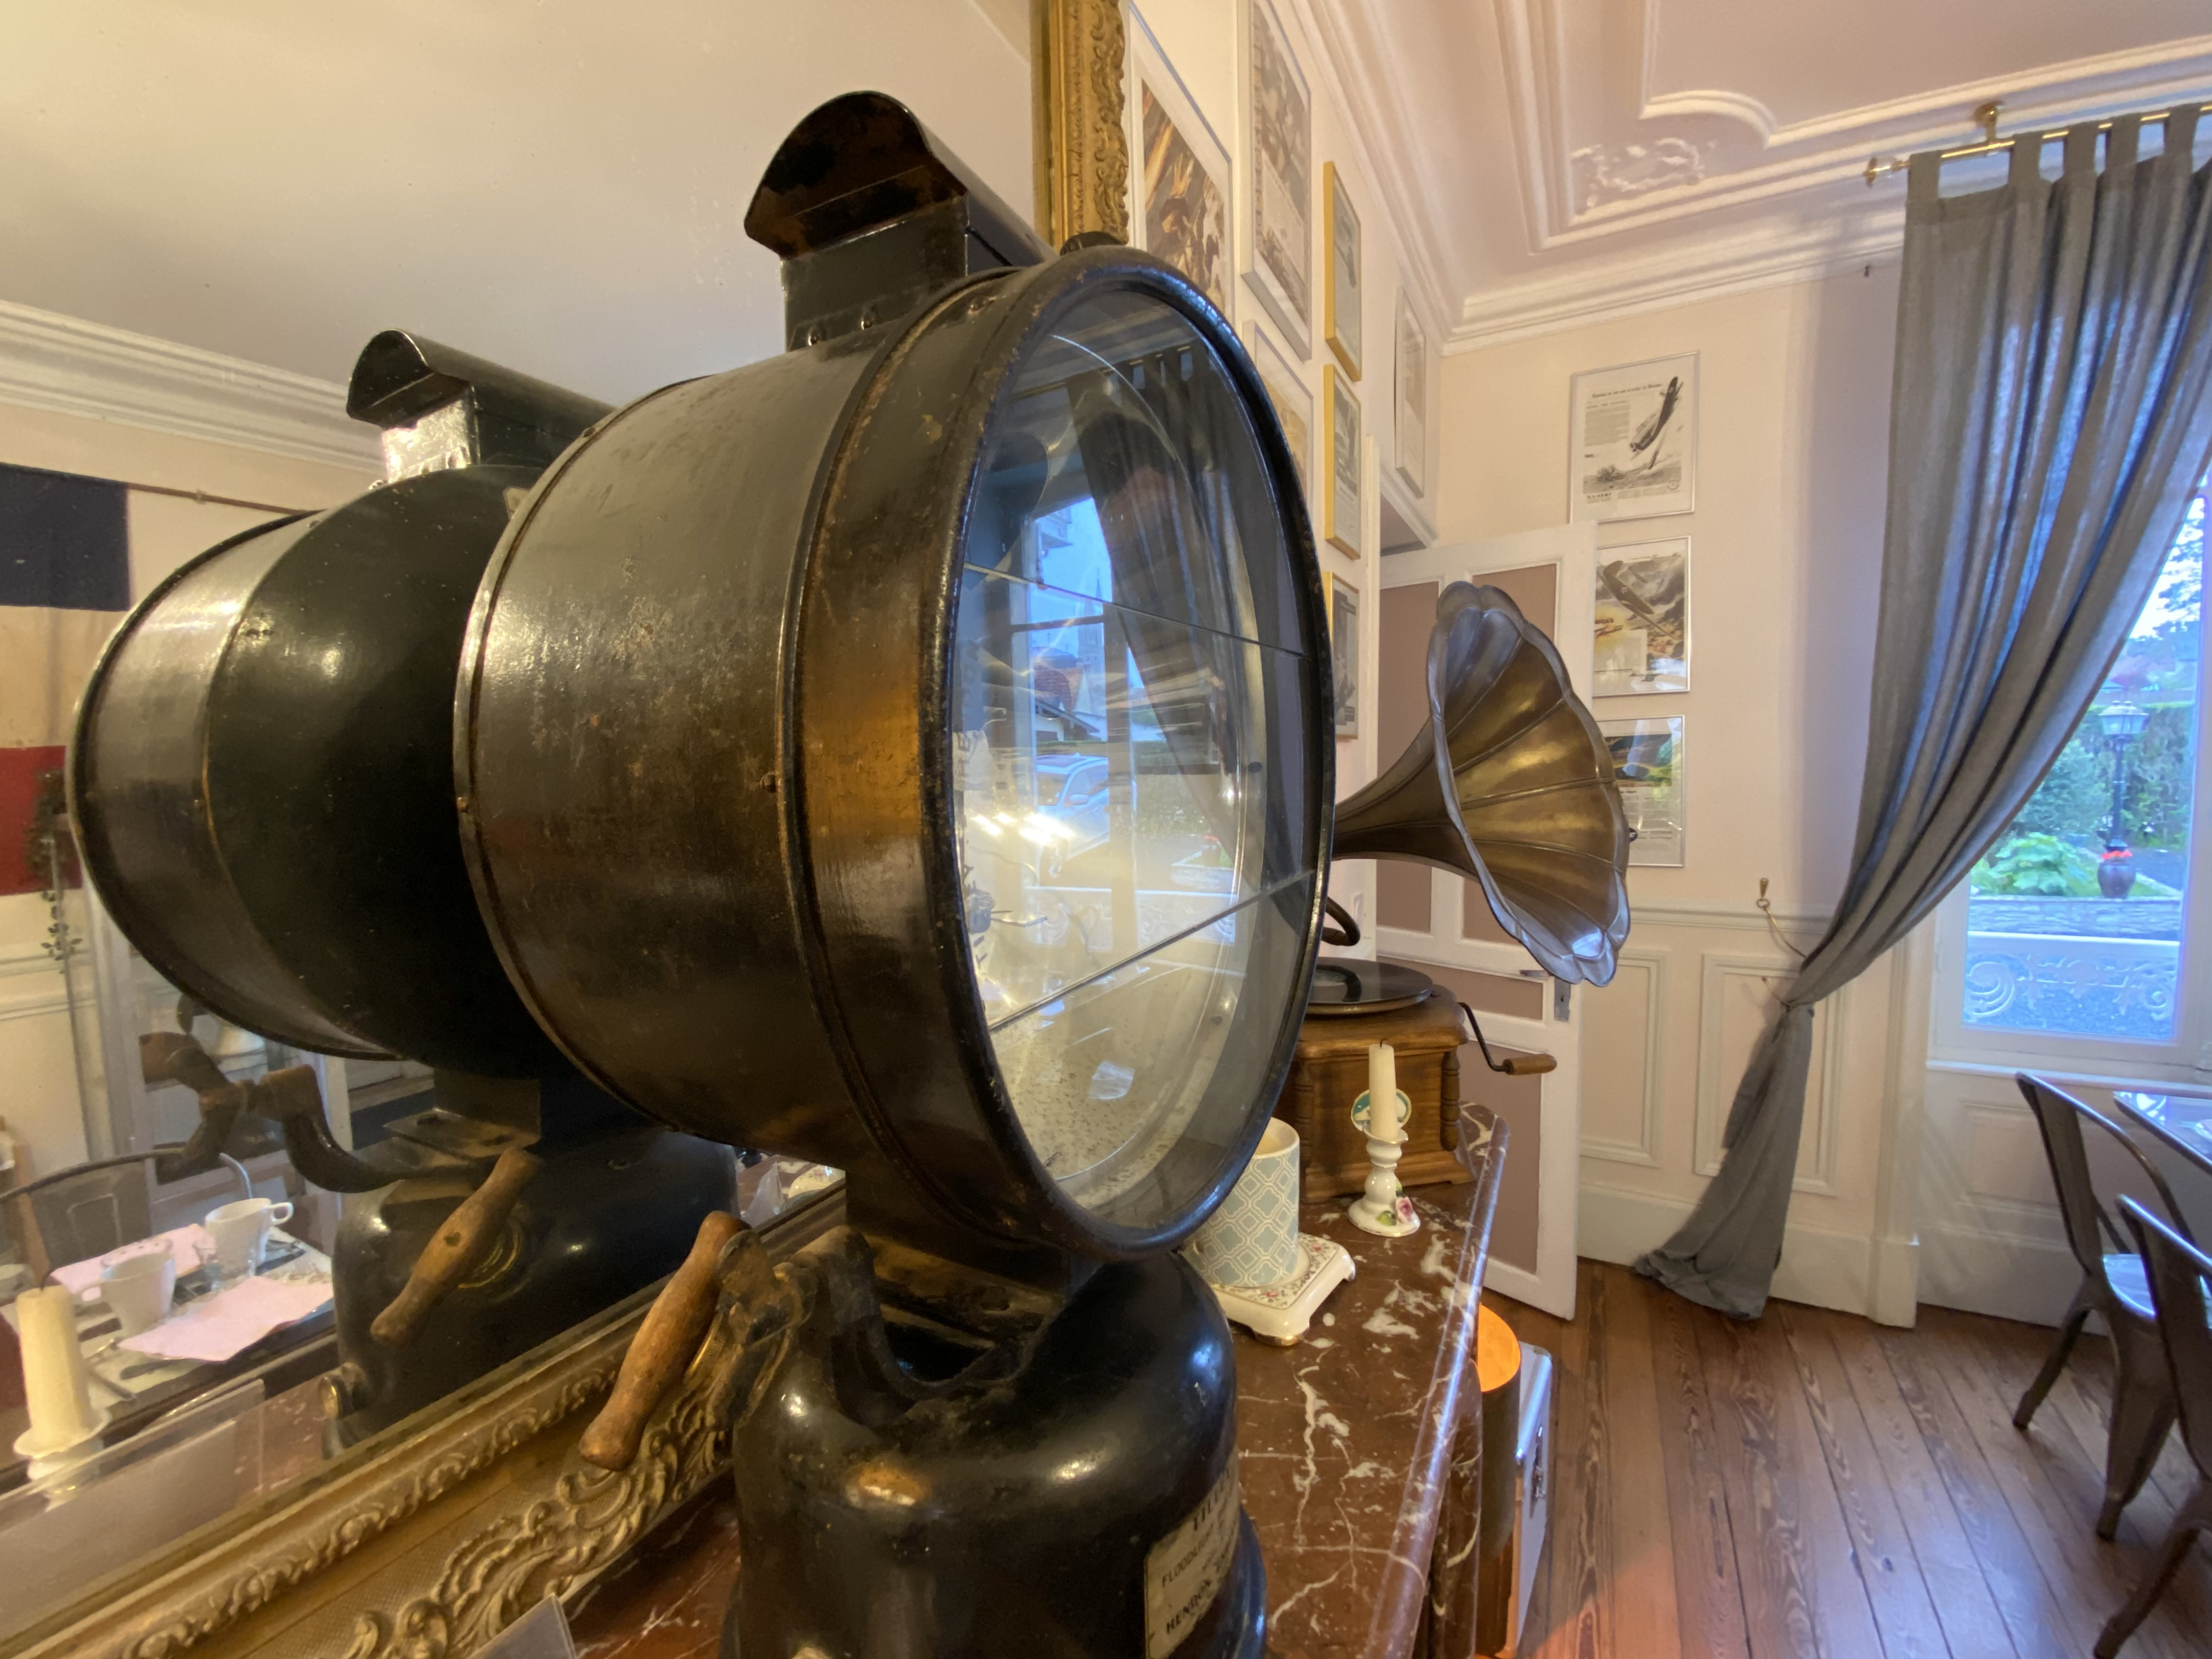 DDAY Aviators Le Manoir RAF Tilley lamp